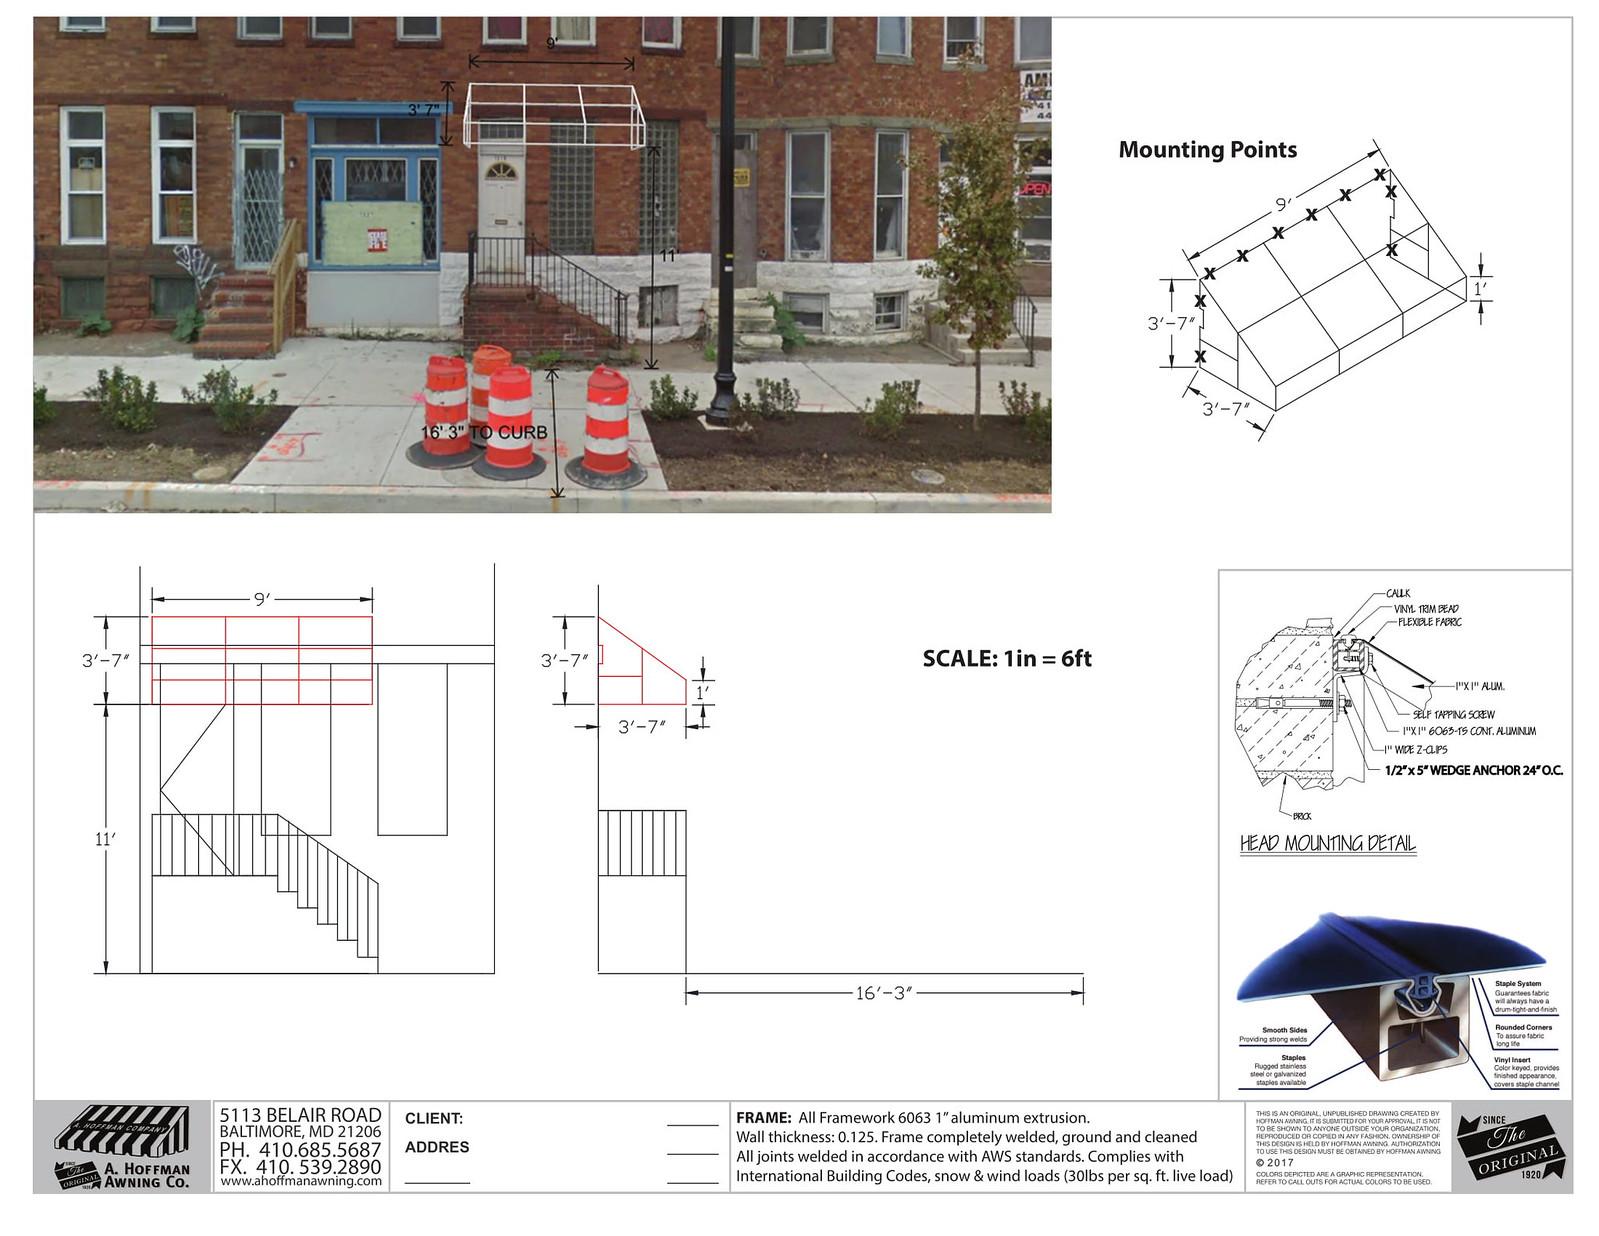 Cad Awning Design Baltimore-Hoffman Awning